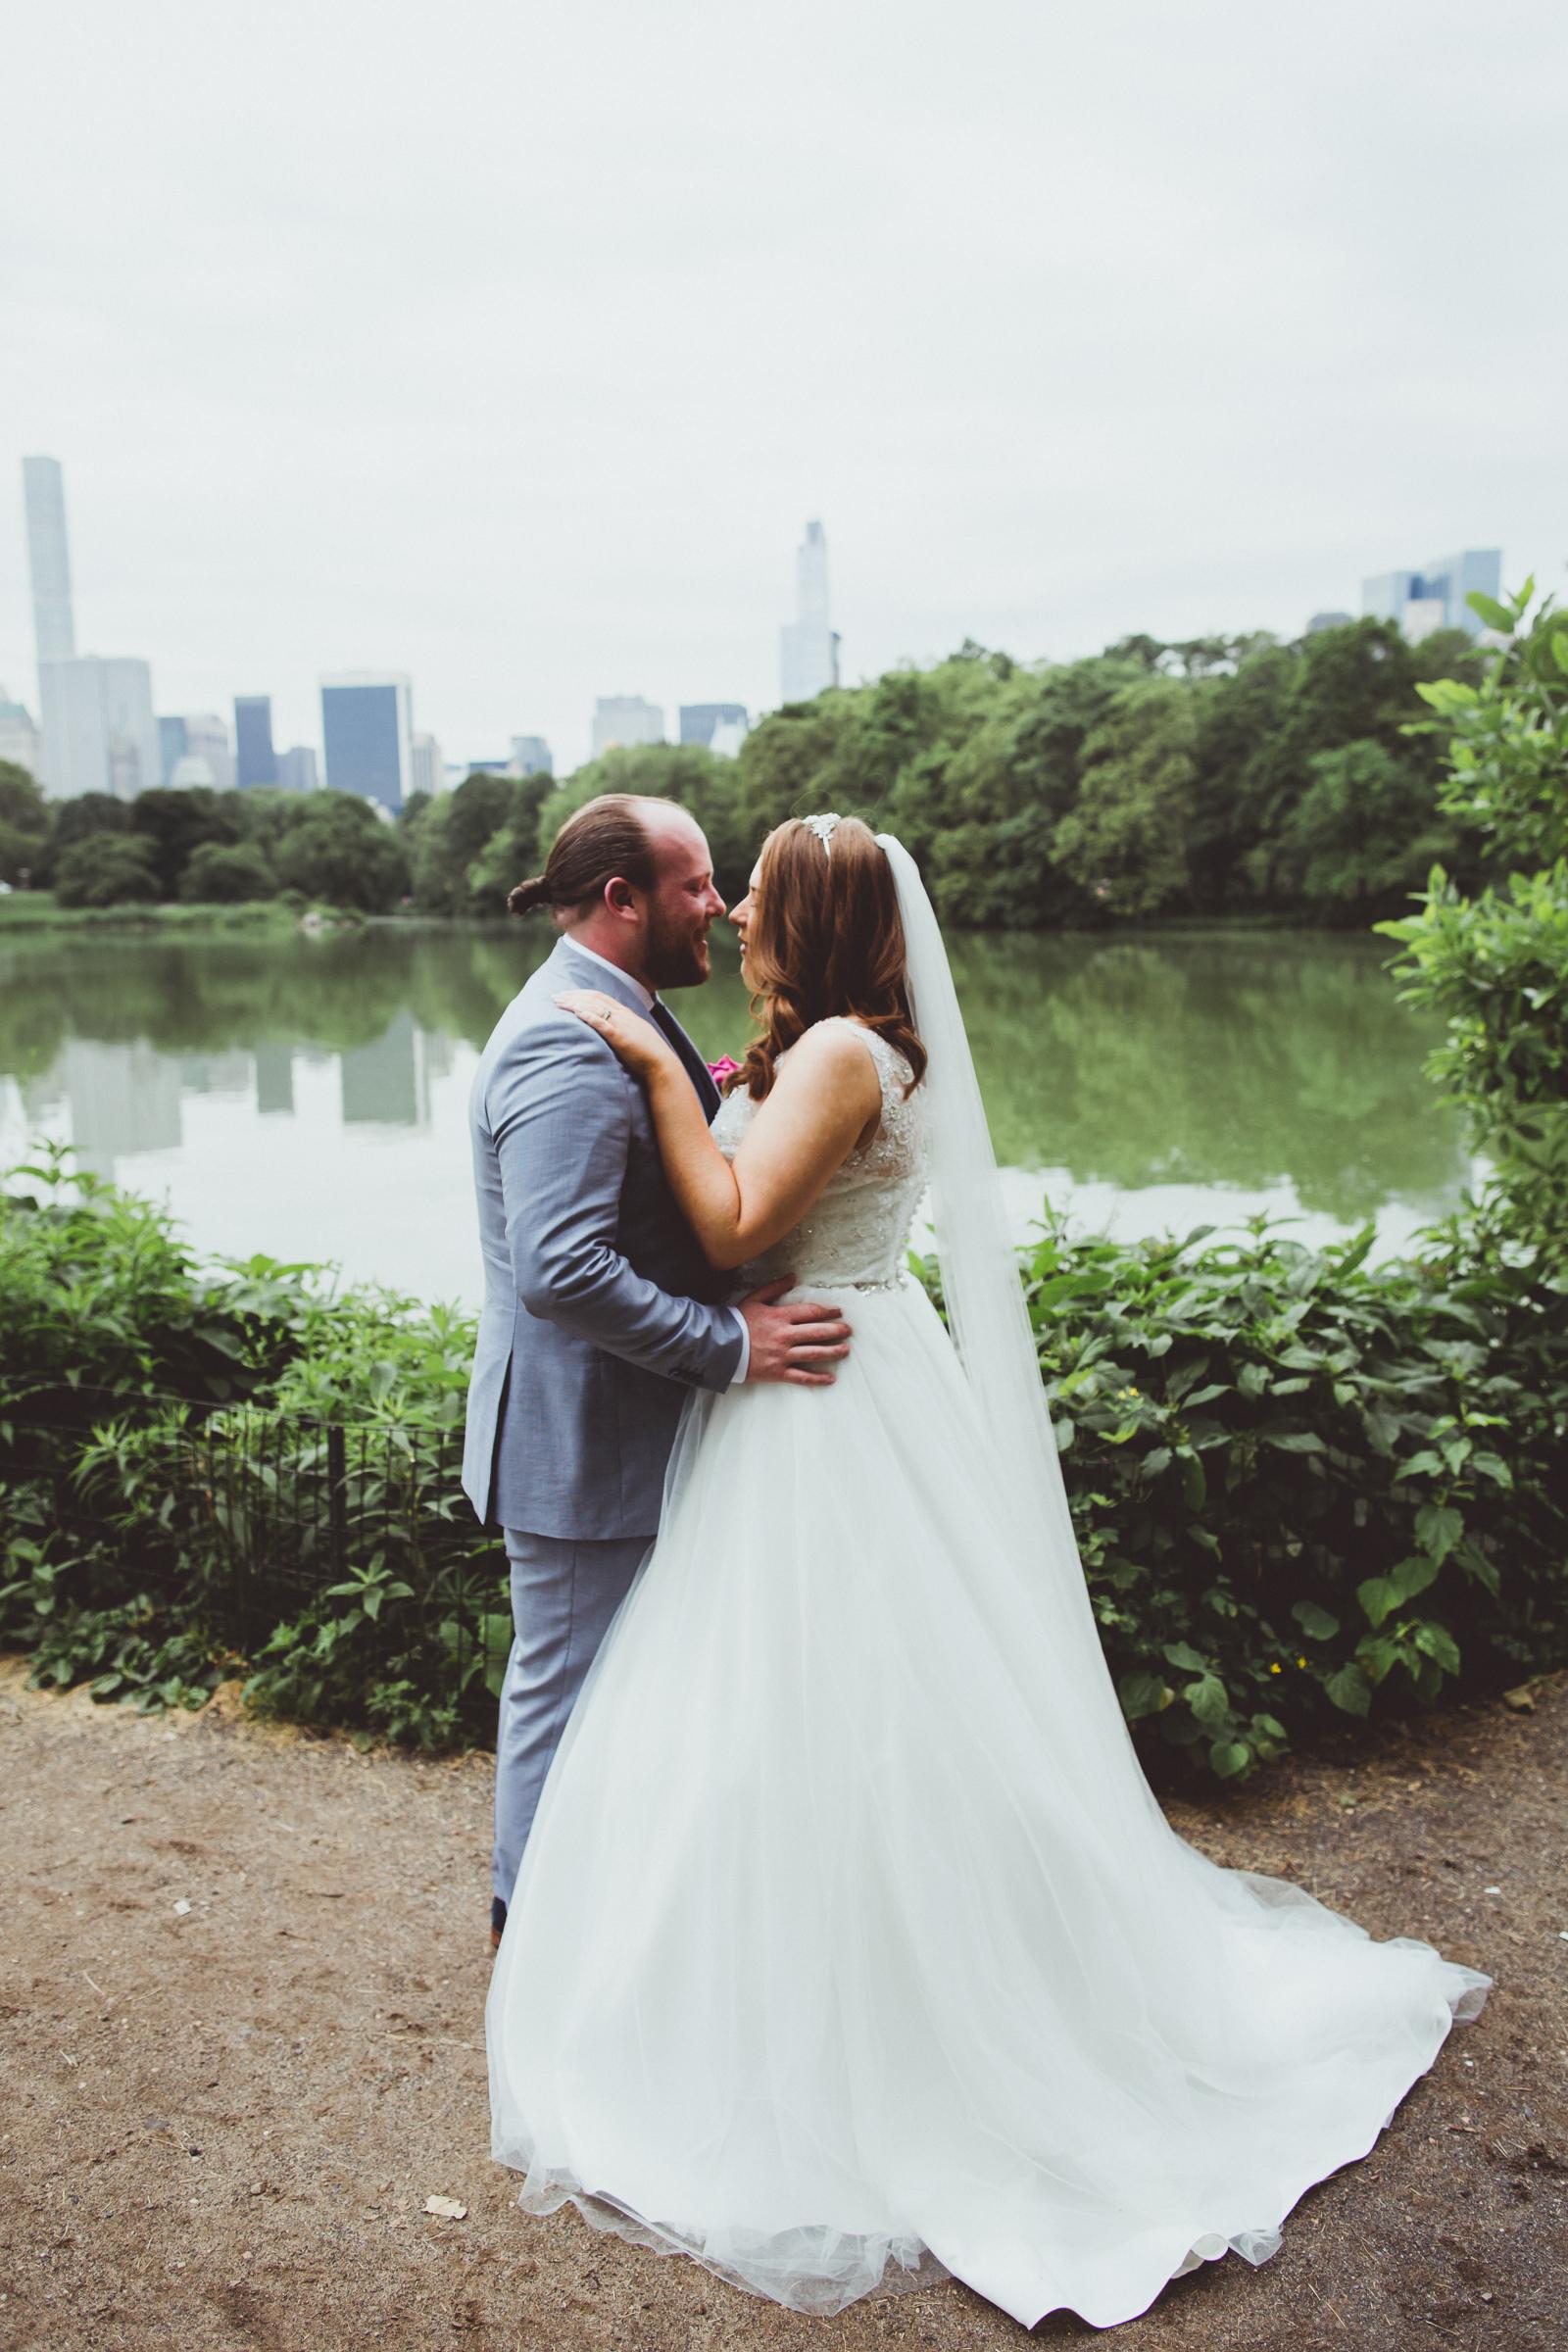 NYC-Central-Park-Elopement-New-York-Documentary-Wedding-Photographer-Dumbo-Brooklyn-Bridge-Park--25.jpg